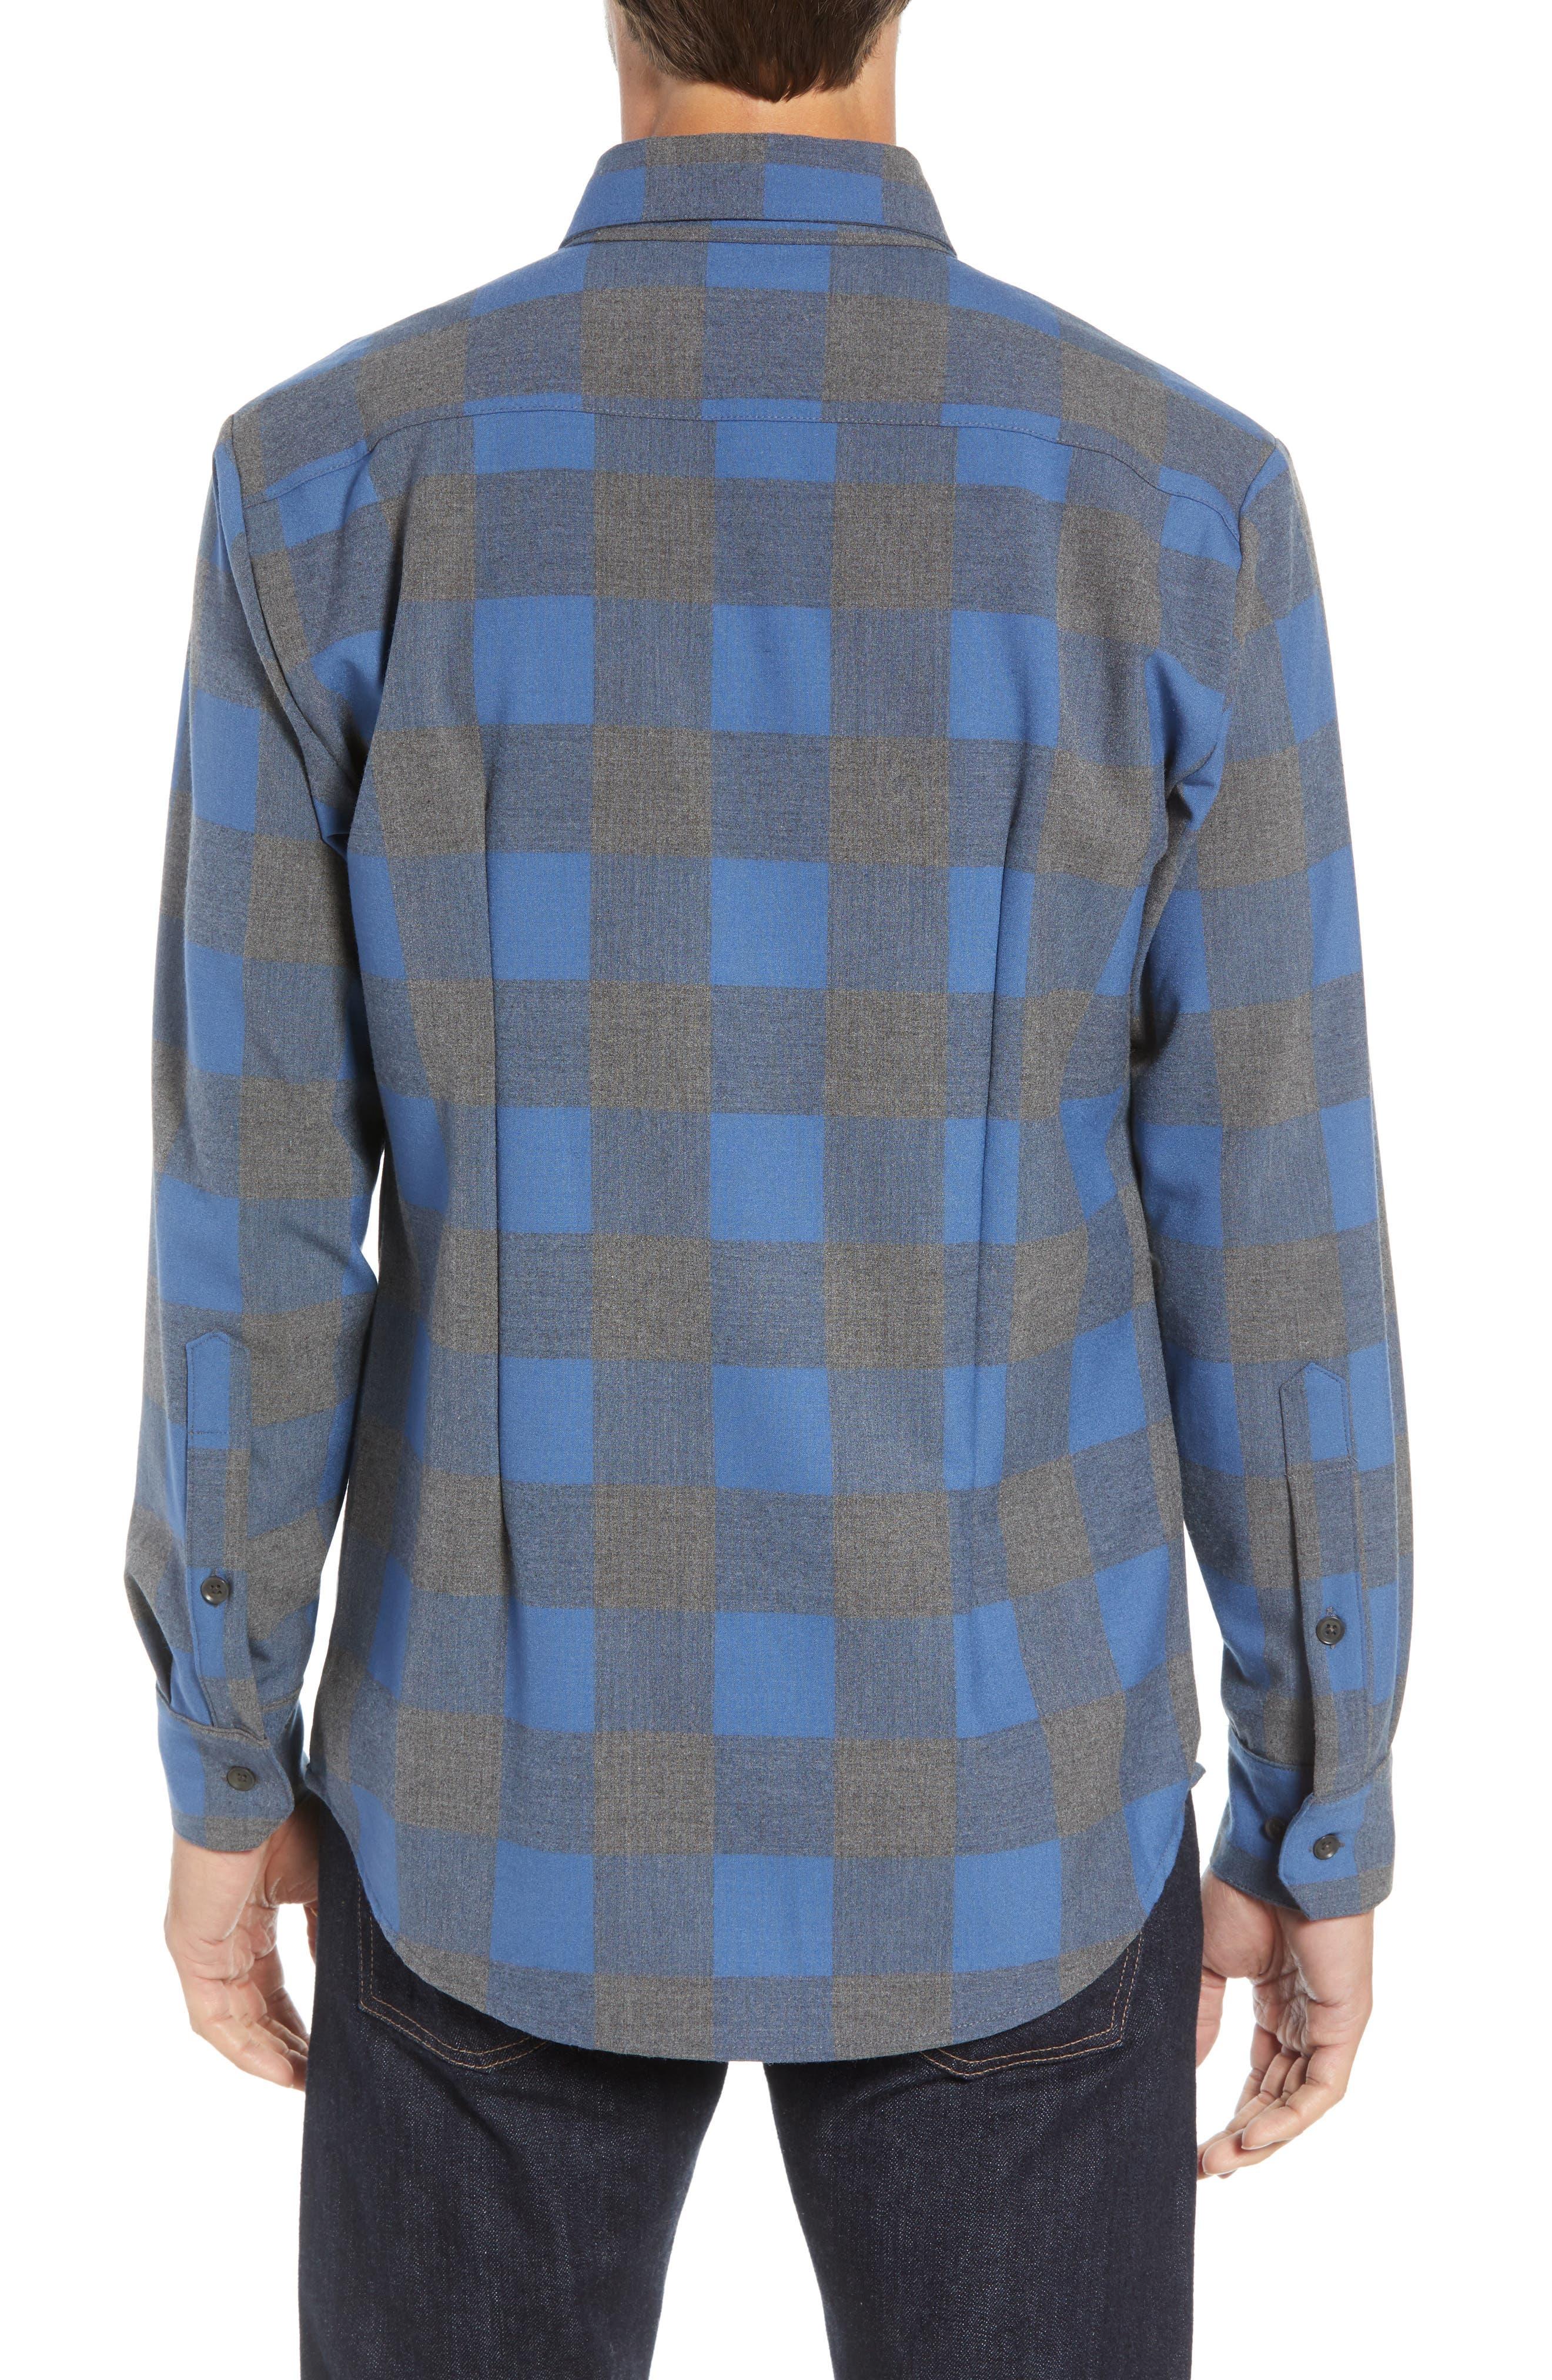 Sierra Regular Fit Flannel Sport Shirt,                             Alternate thumbnail 3, color,                             GREY